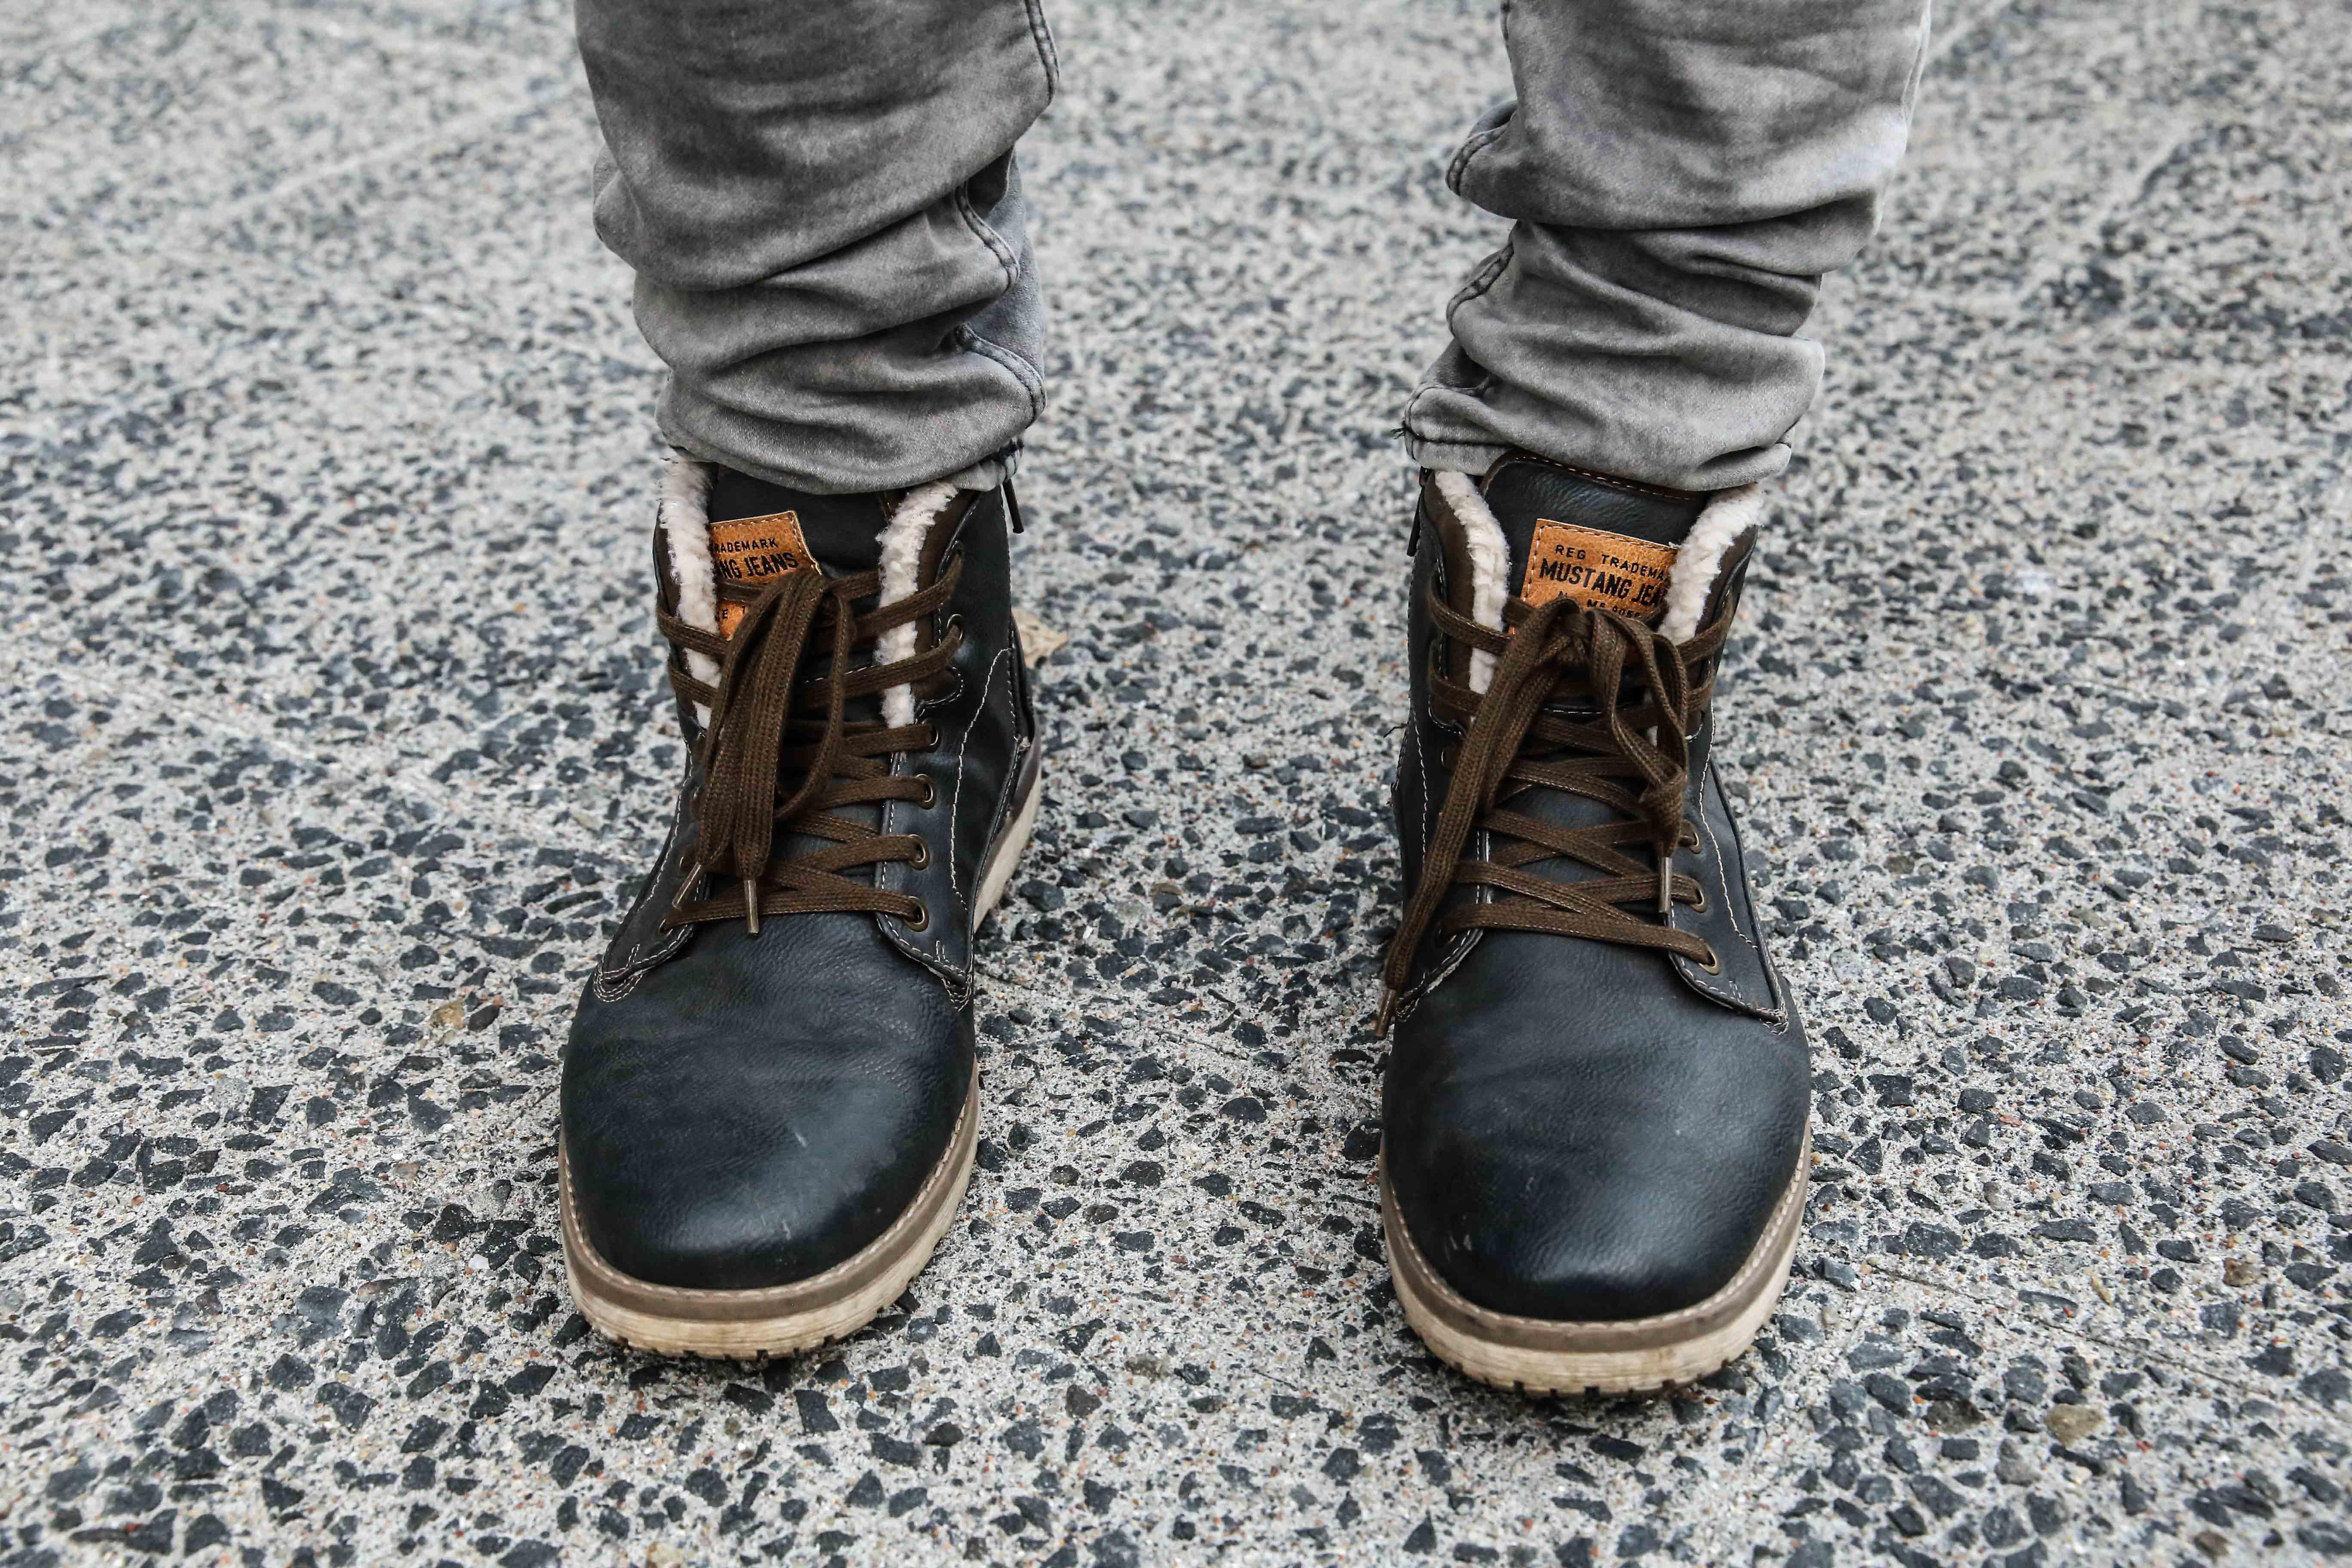 lässiger-herbstlook-graue-jeans-braunes-holzfällerhemd-modeblog-fashionblog-fashion-blogger-berlin_1673